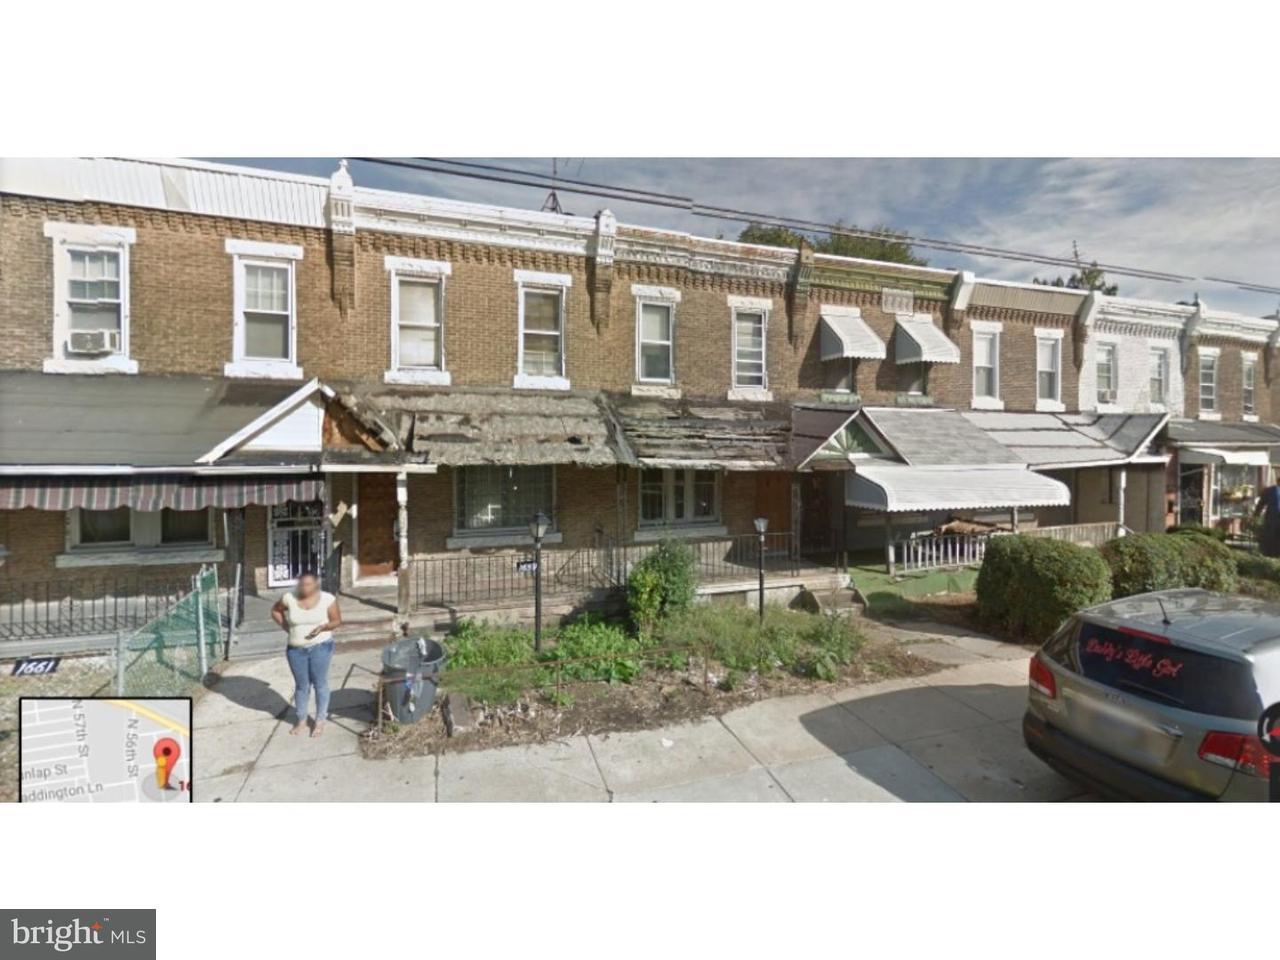 1657 N Allison Philadelphia , PA 19131